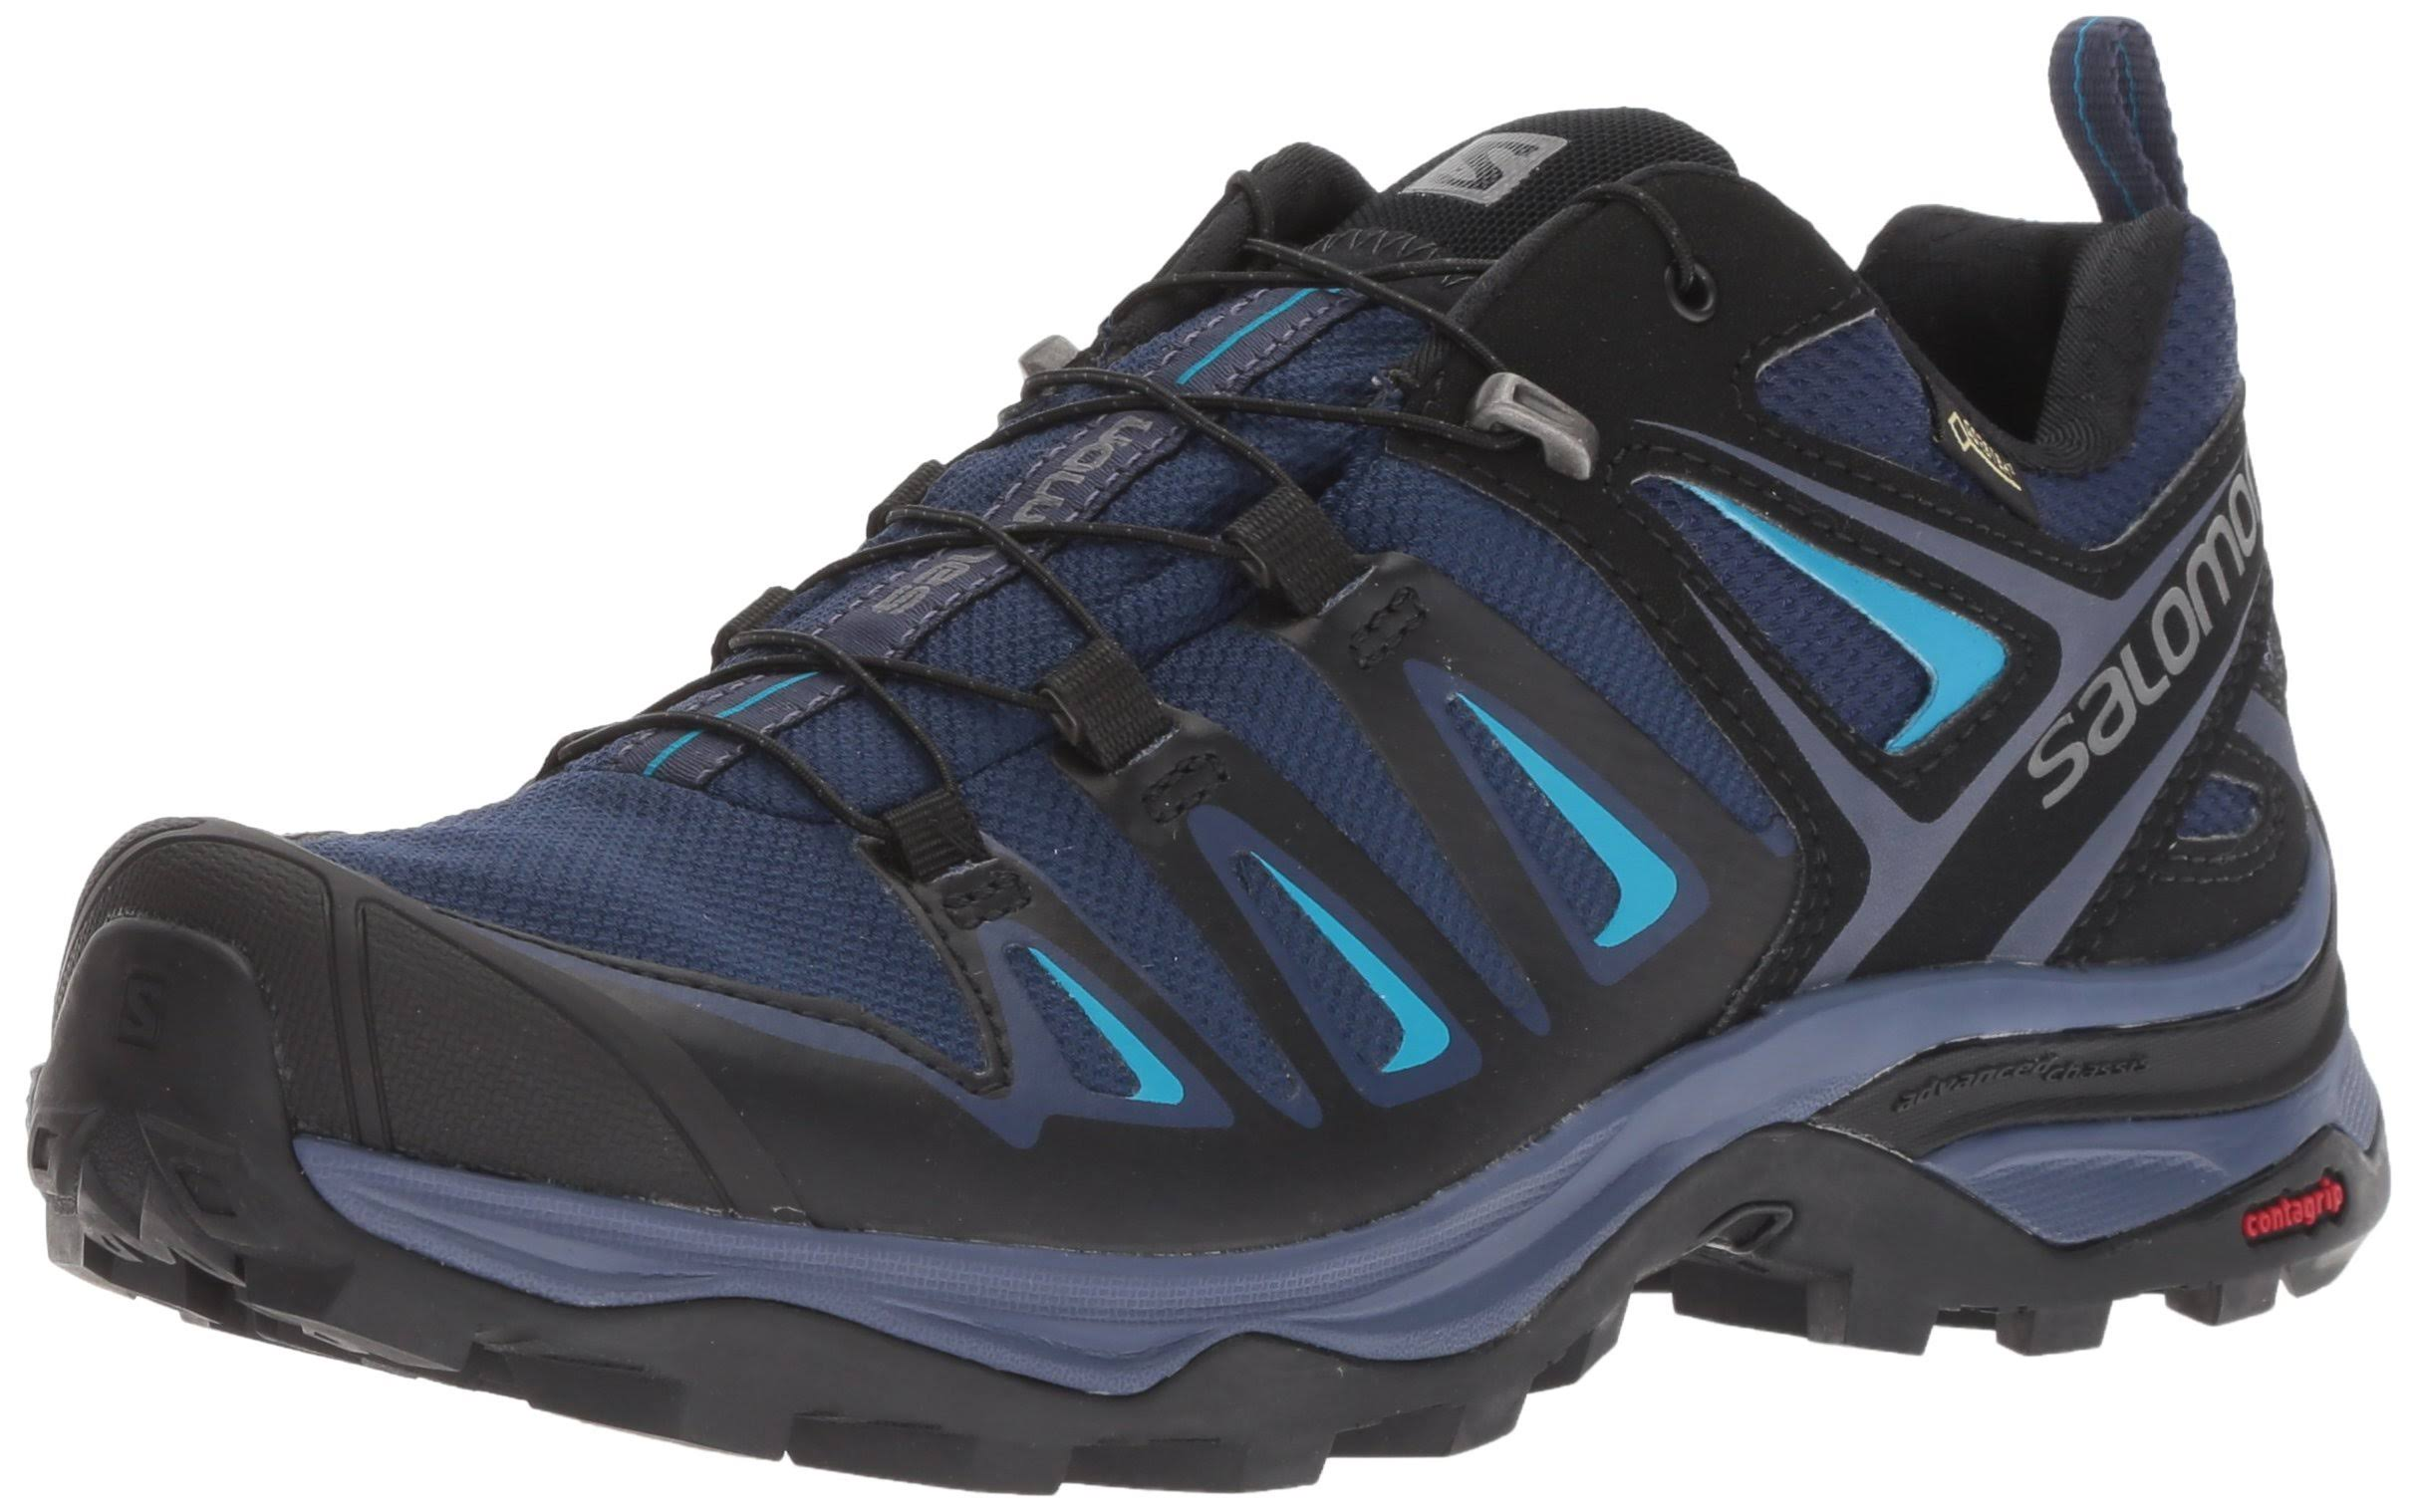 Gt Damen 3 X Schuh Trail Ultra Salomon tIw7Sdqg